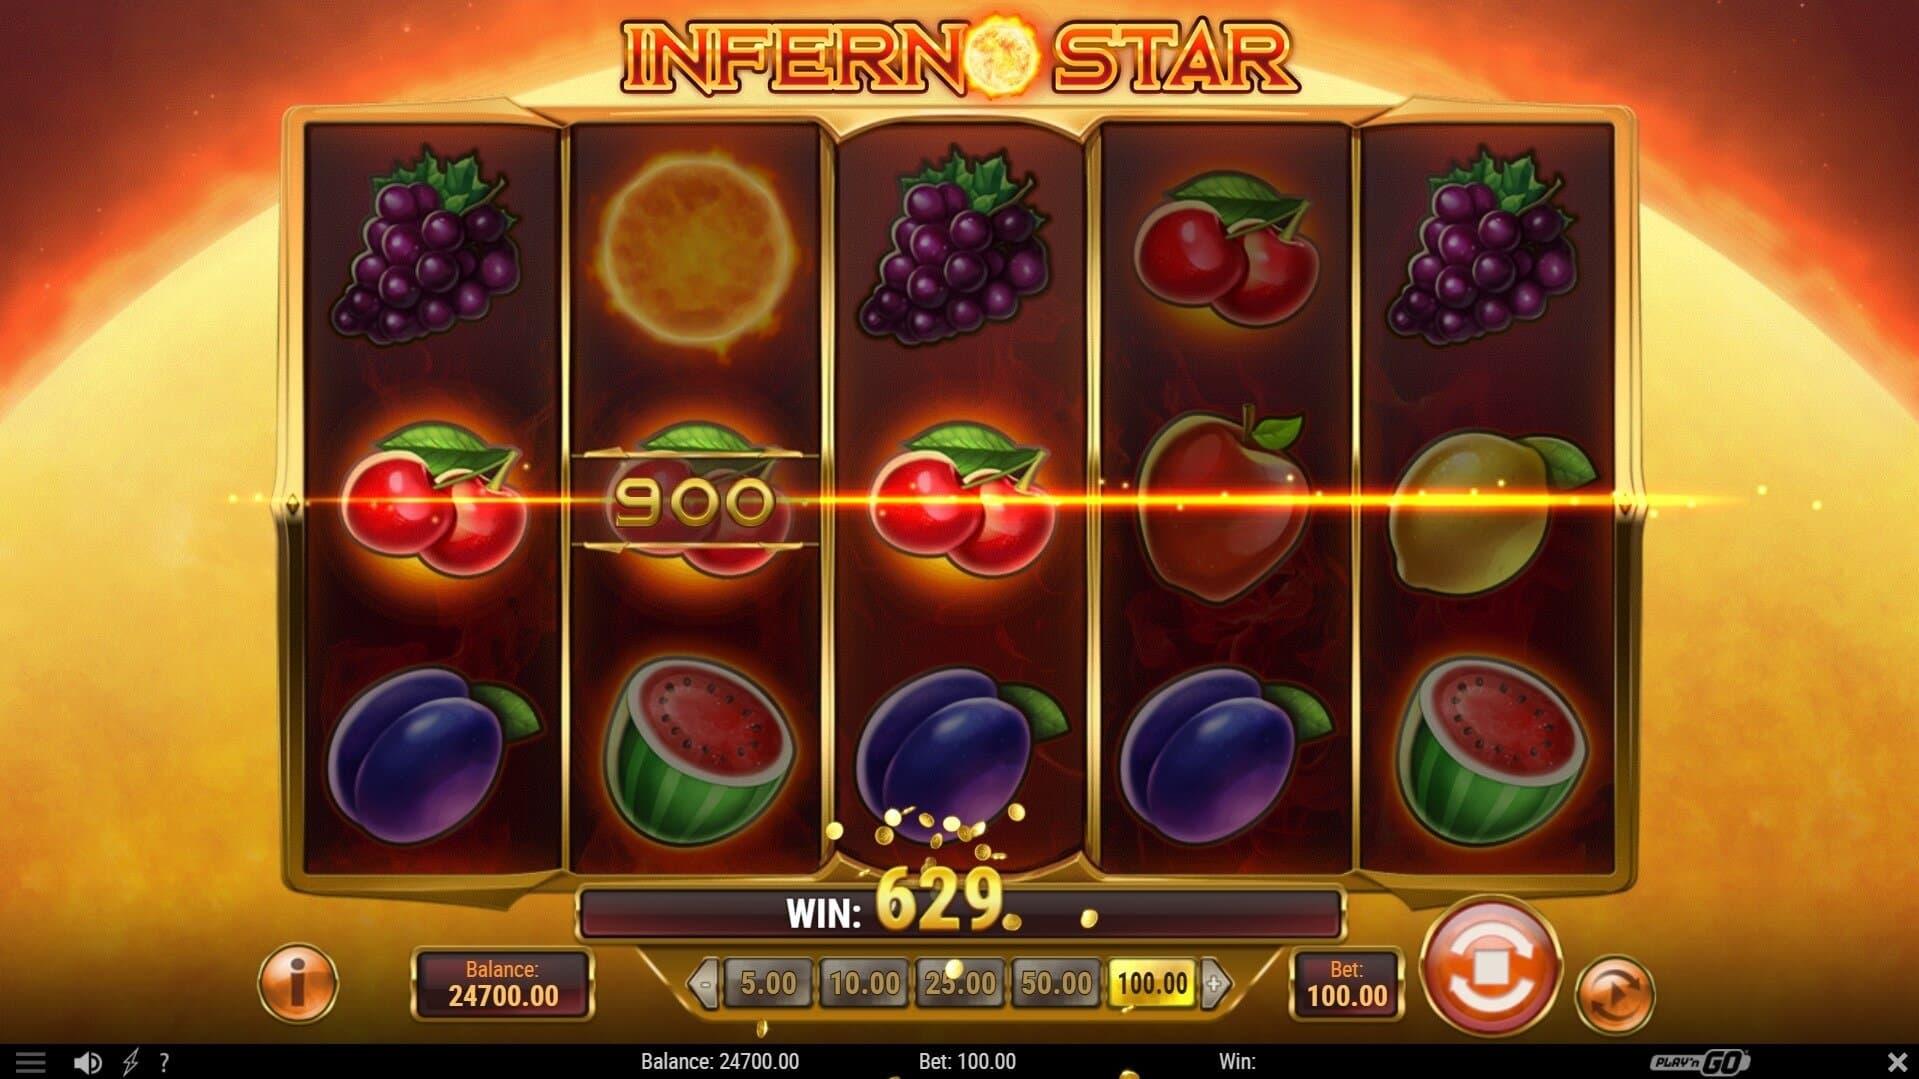 Star Casino Game Rules